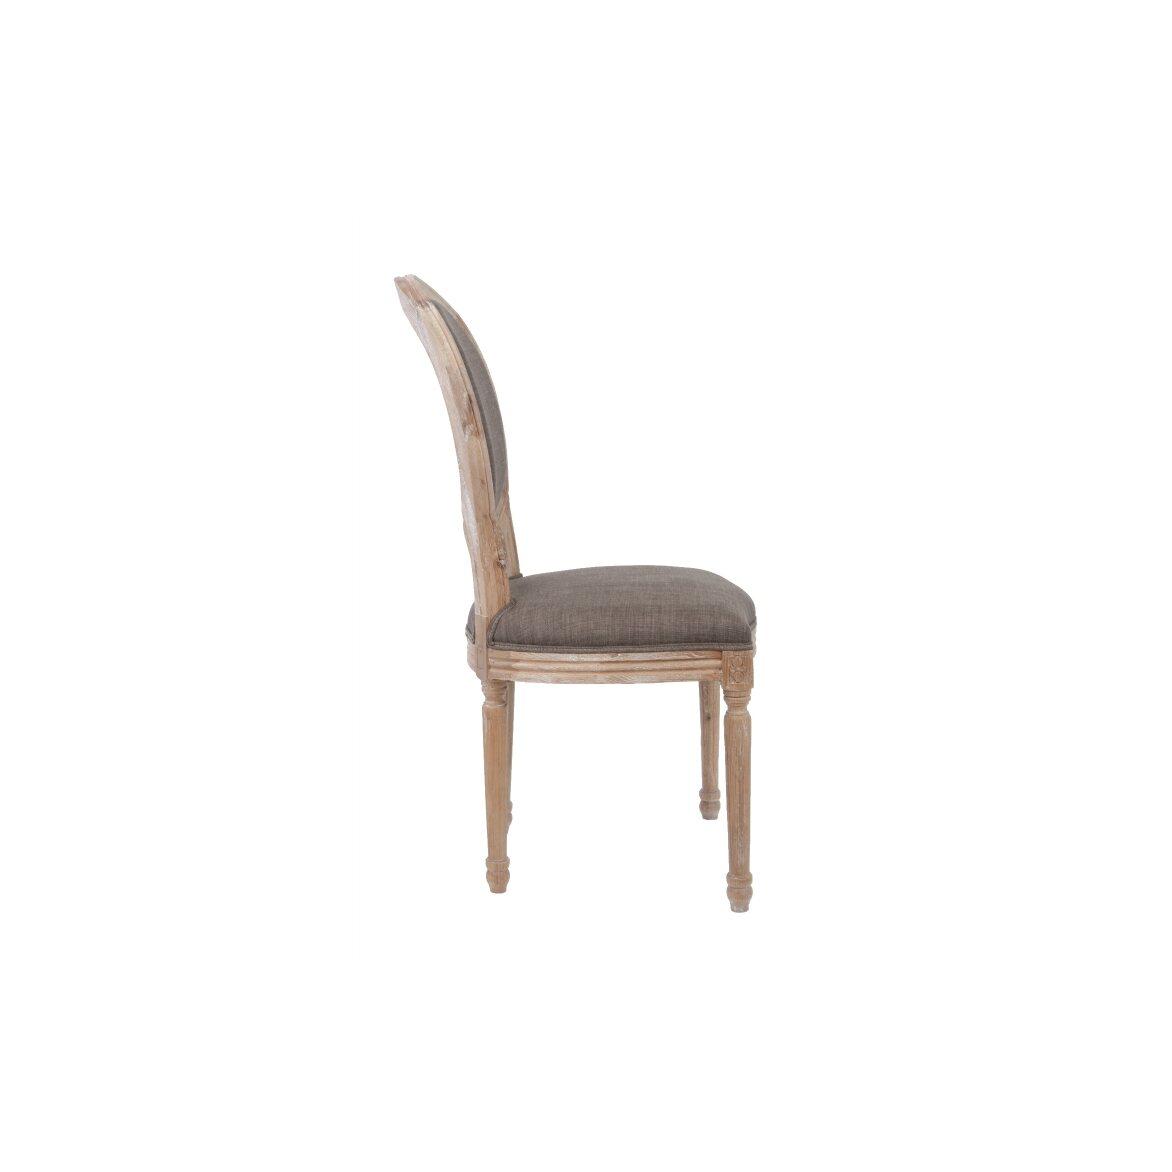 Стул Miro brown 2 | Обеденные стулья Kingsby